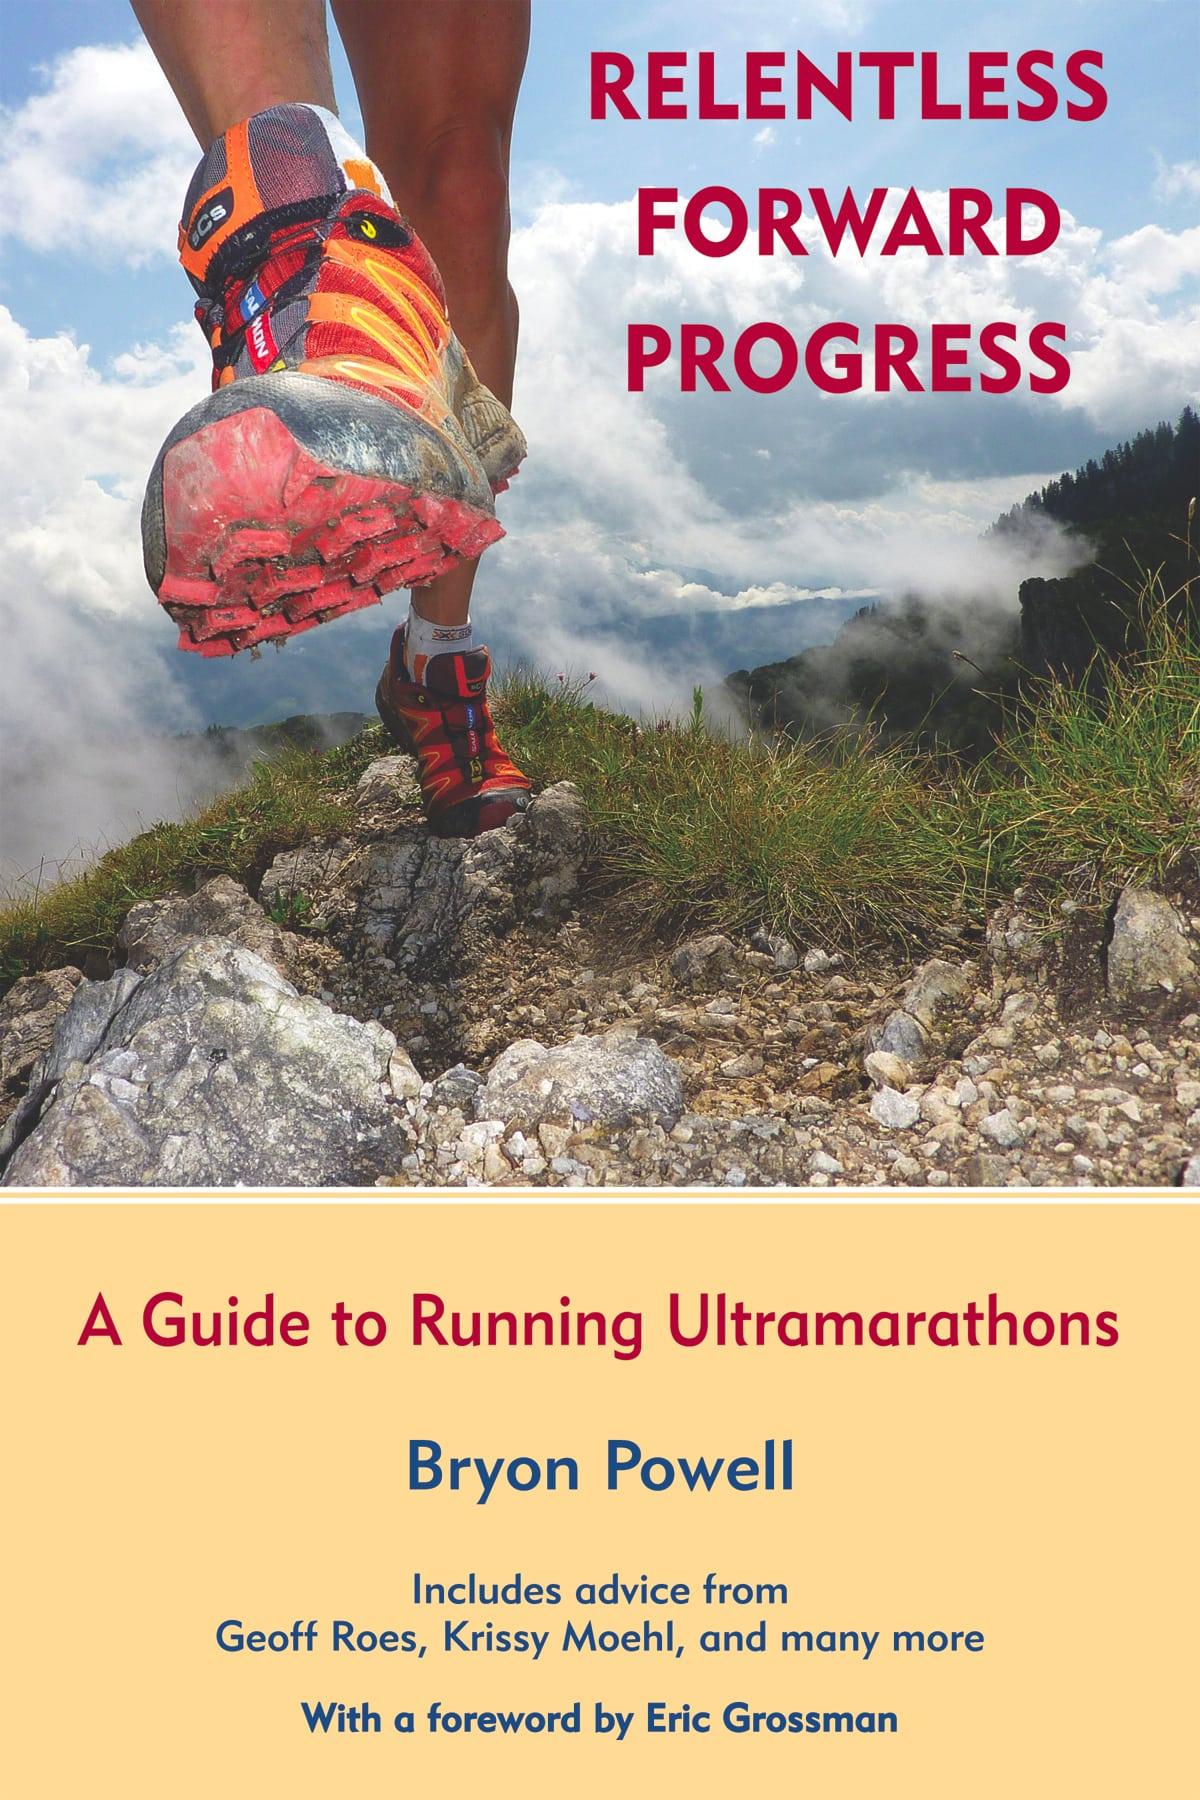 Relentless Forward Progress cover hi-res